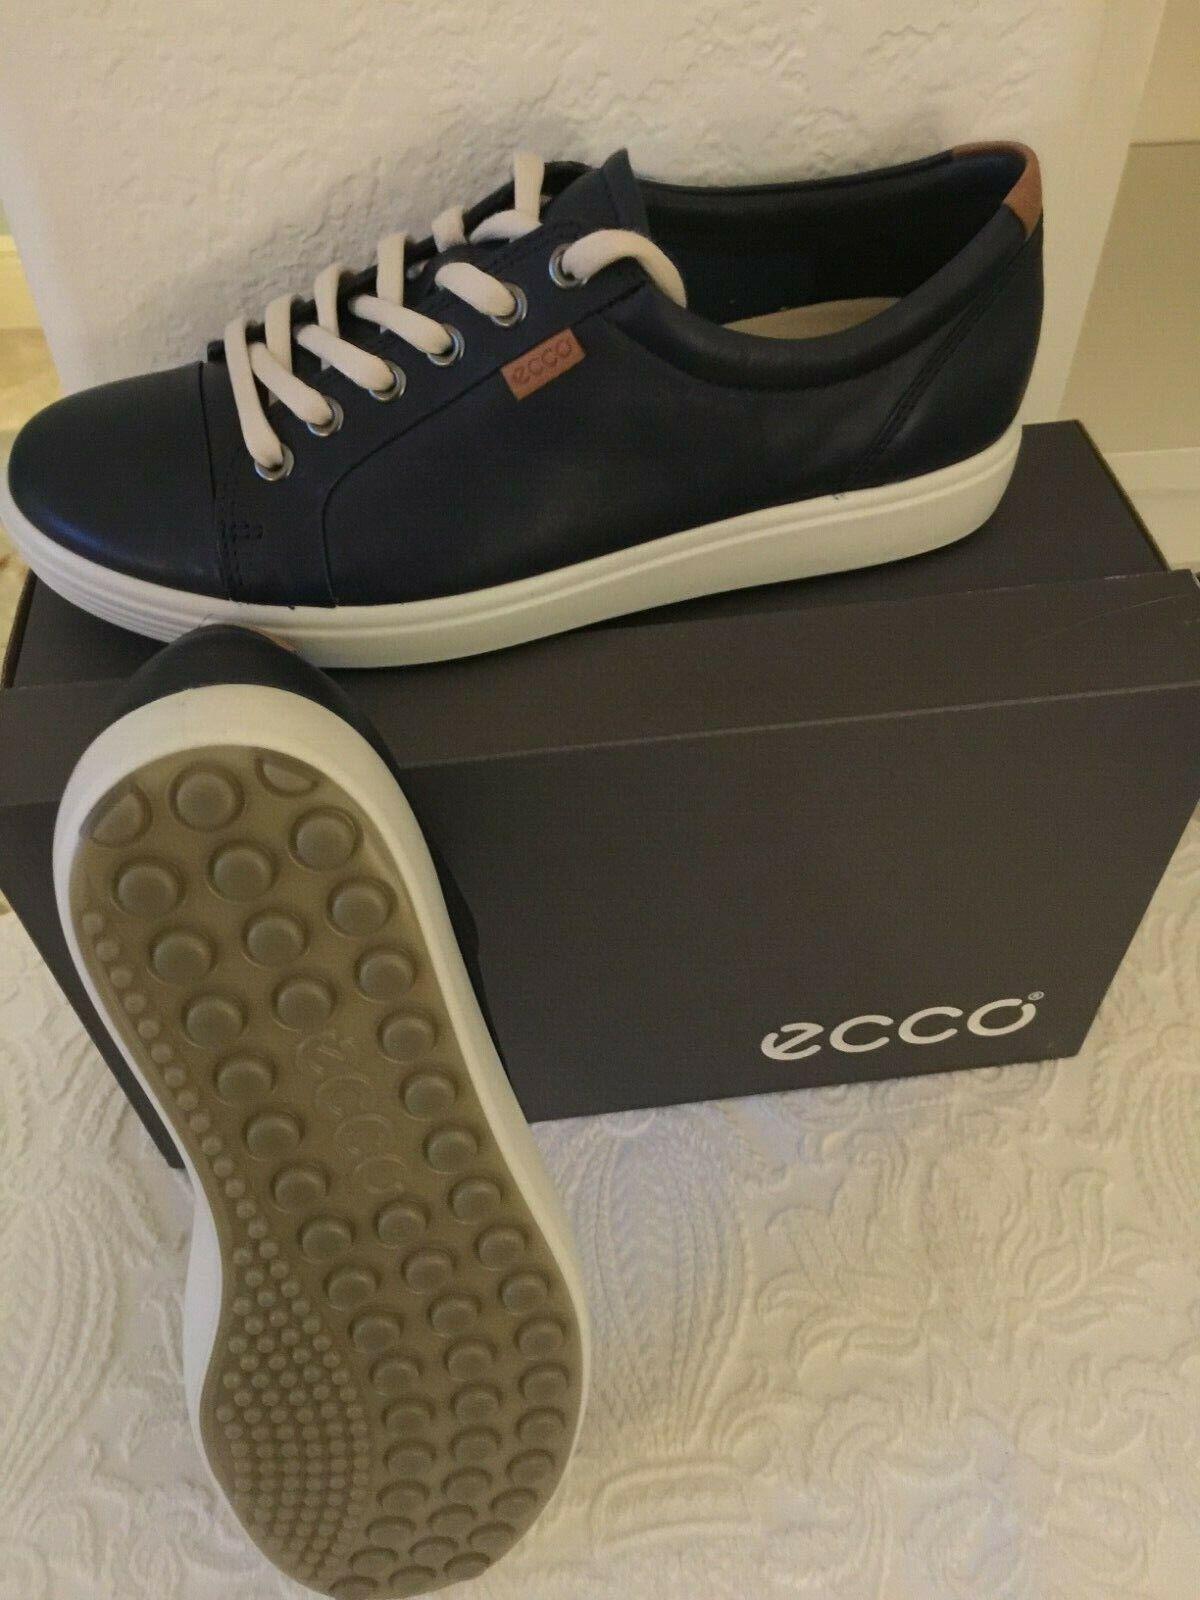 NIB WOMEN ECCO SOFT 7 LADIES SHOES FOOTWEAR SNEAKERS BLACK EU37 6-6.5